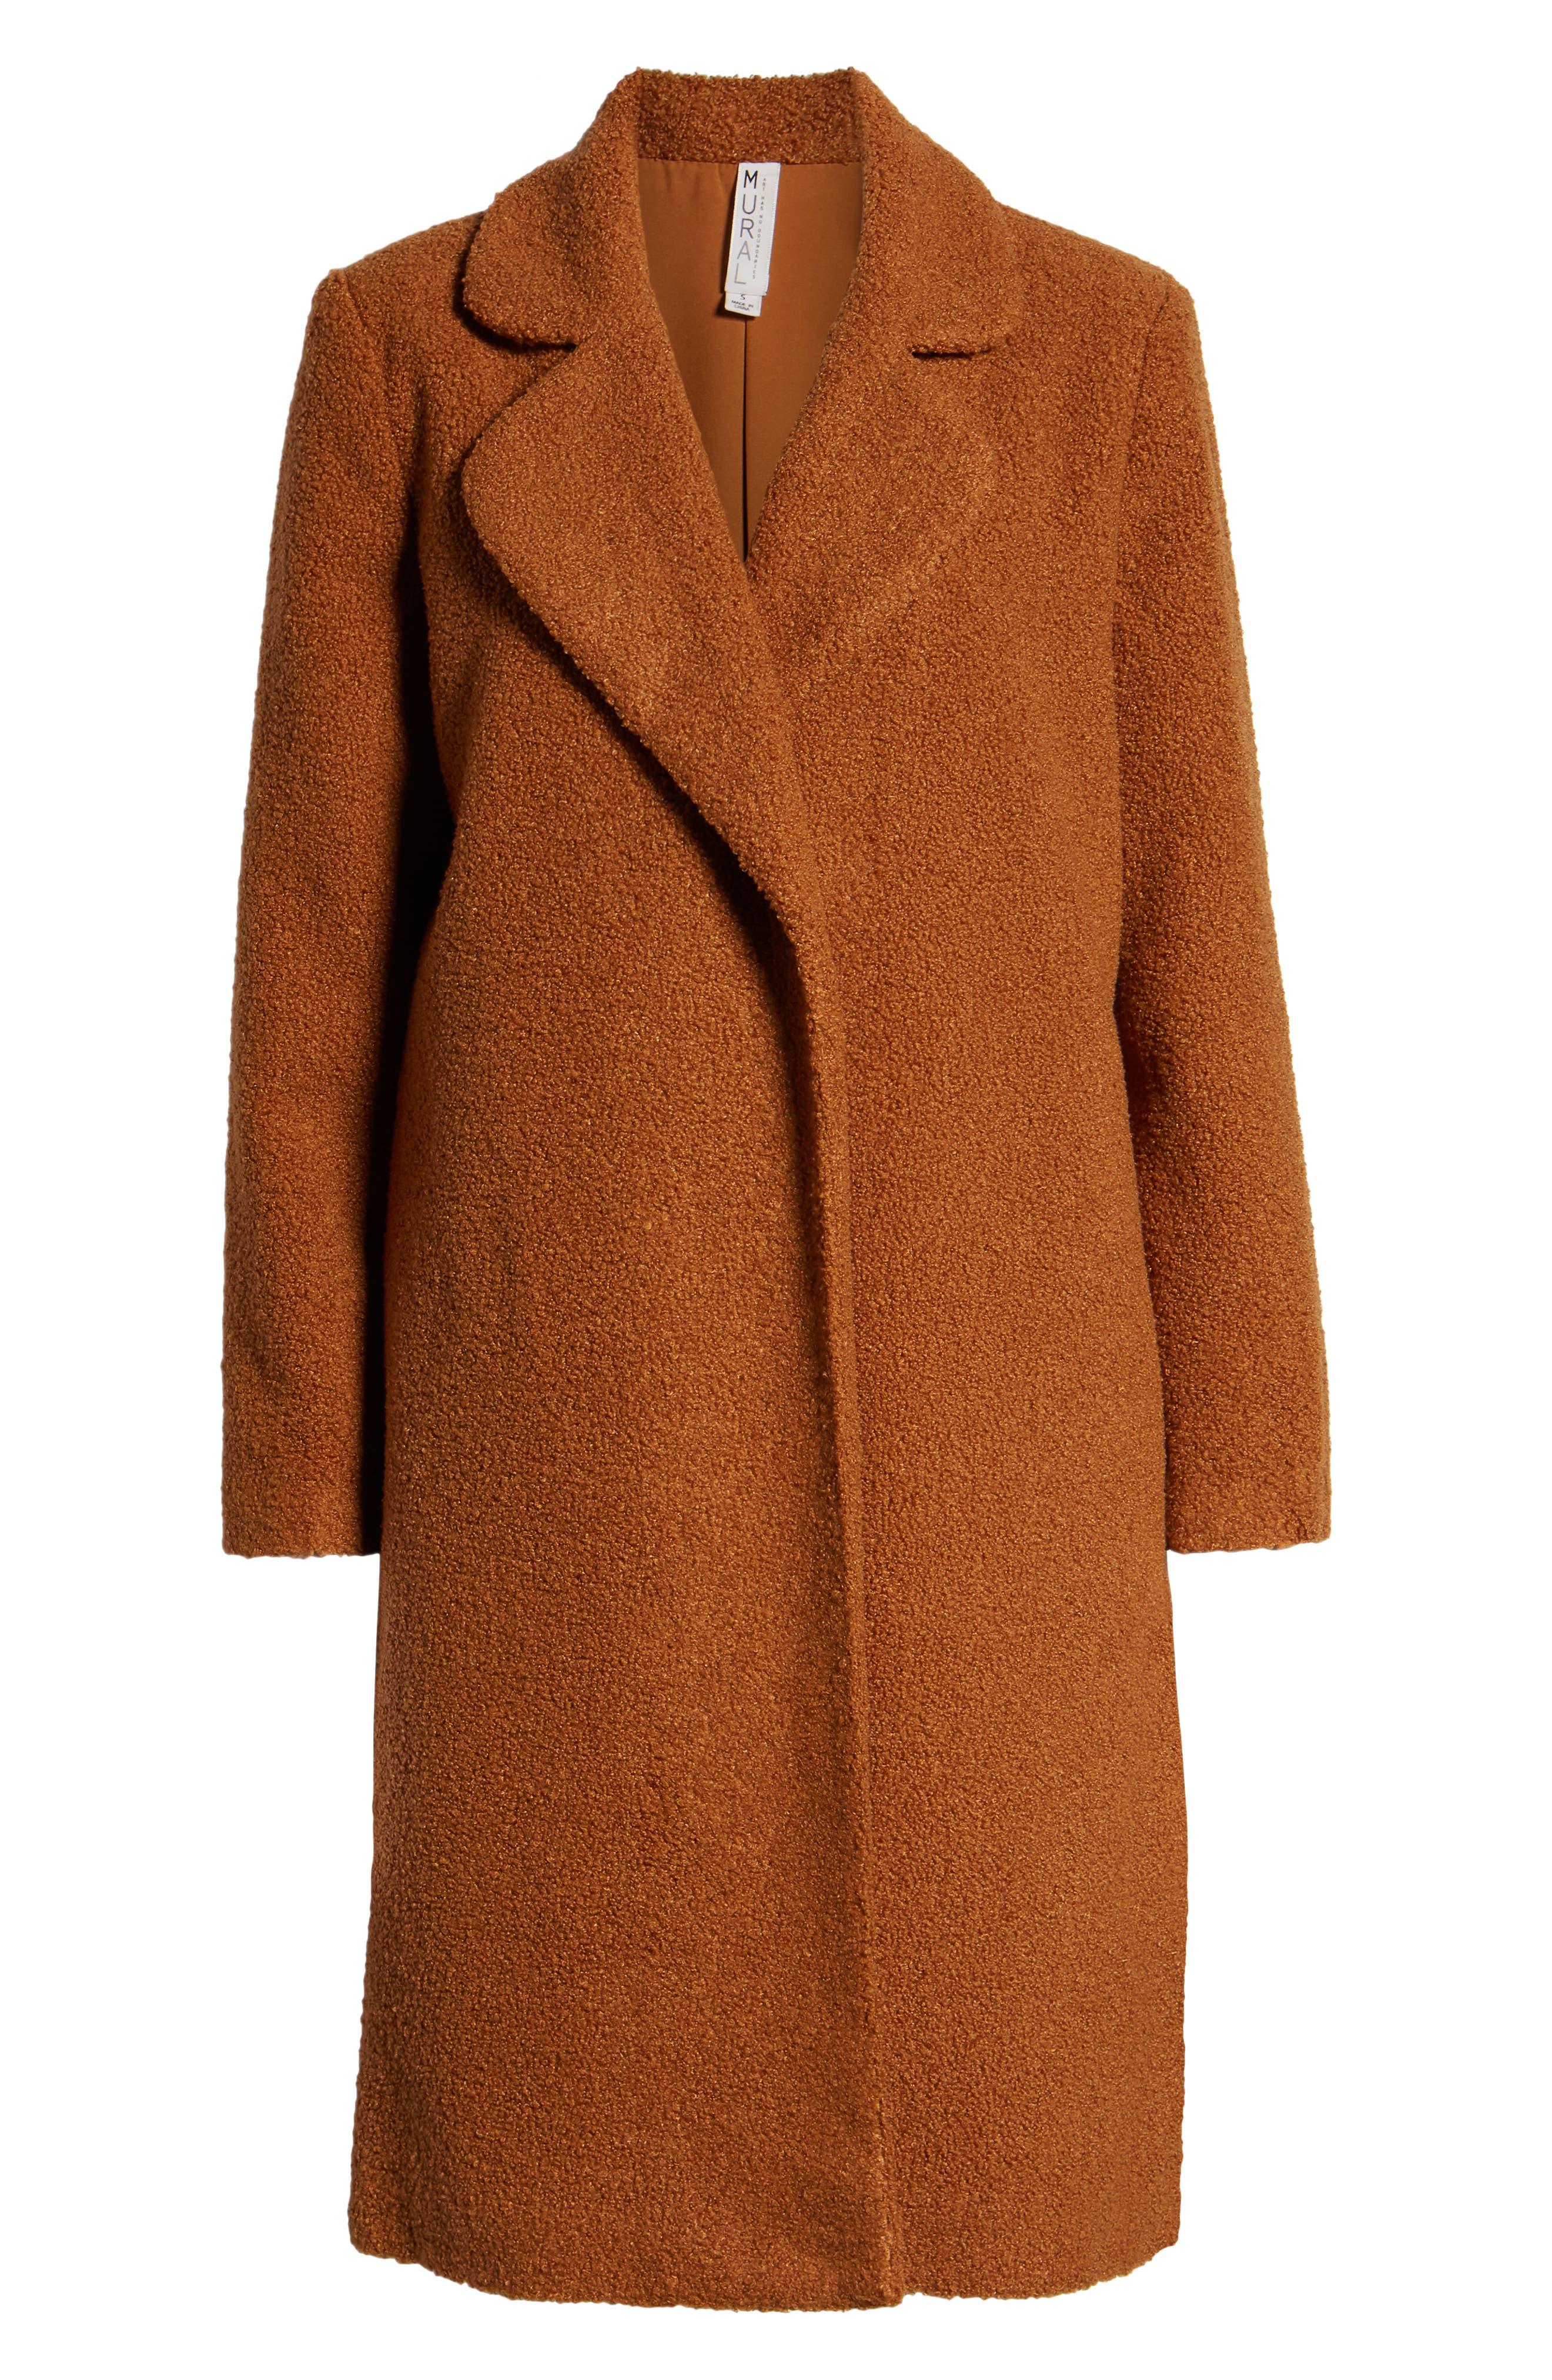 Teddy Bear Coat,                             Alternate thumbnail 6, color,                             MOCHA